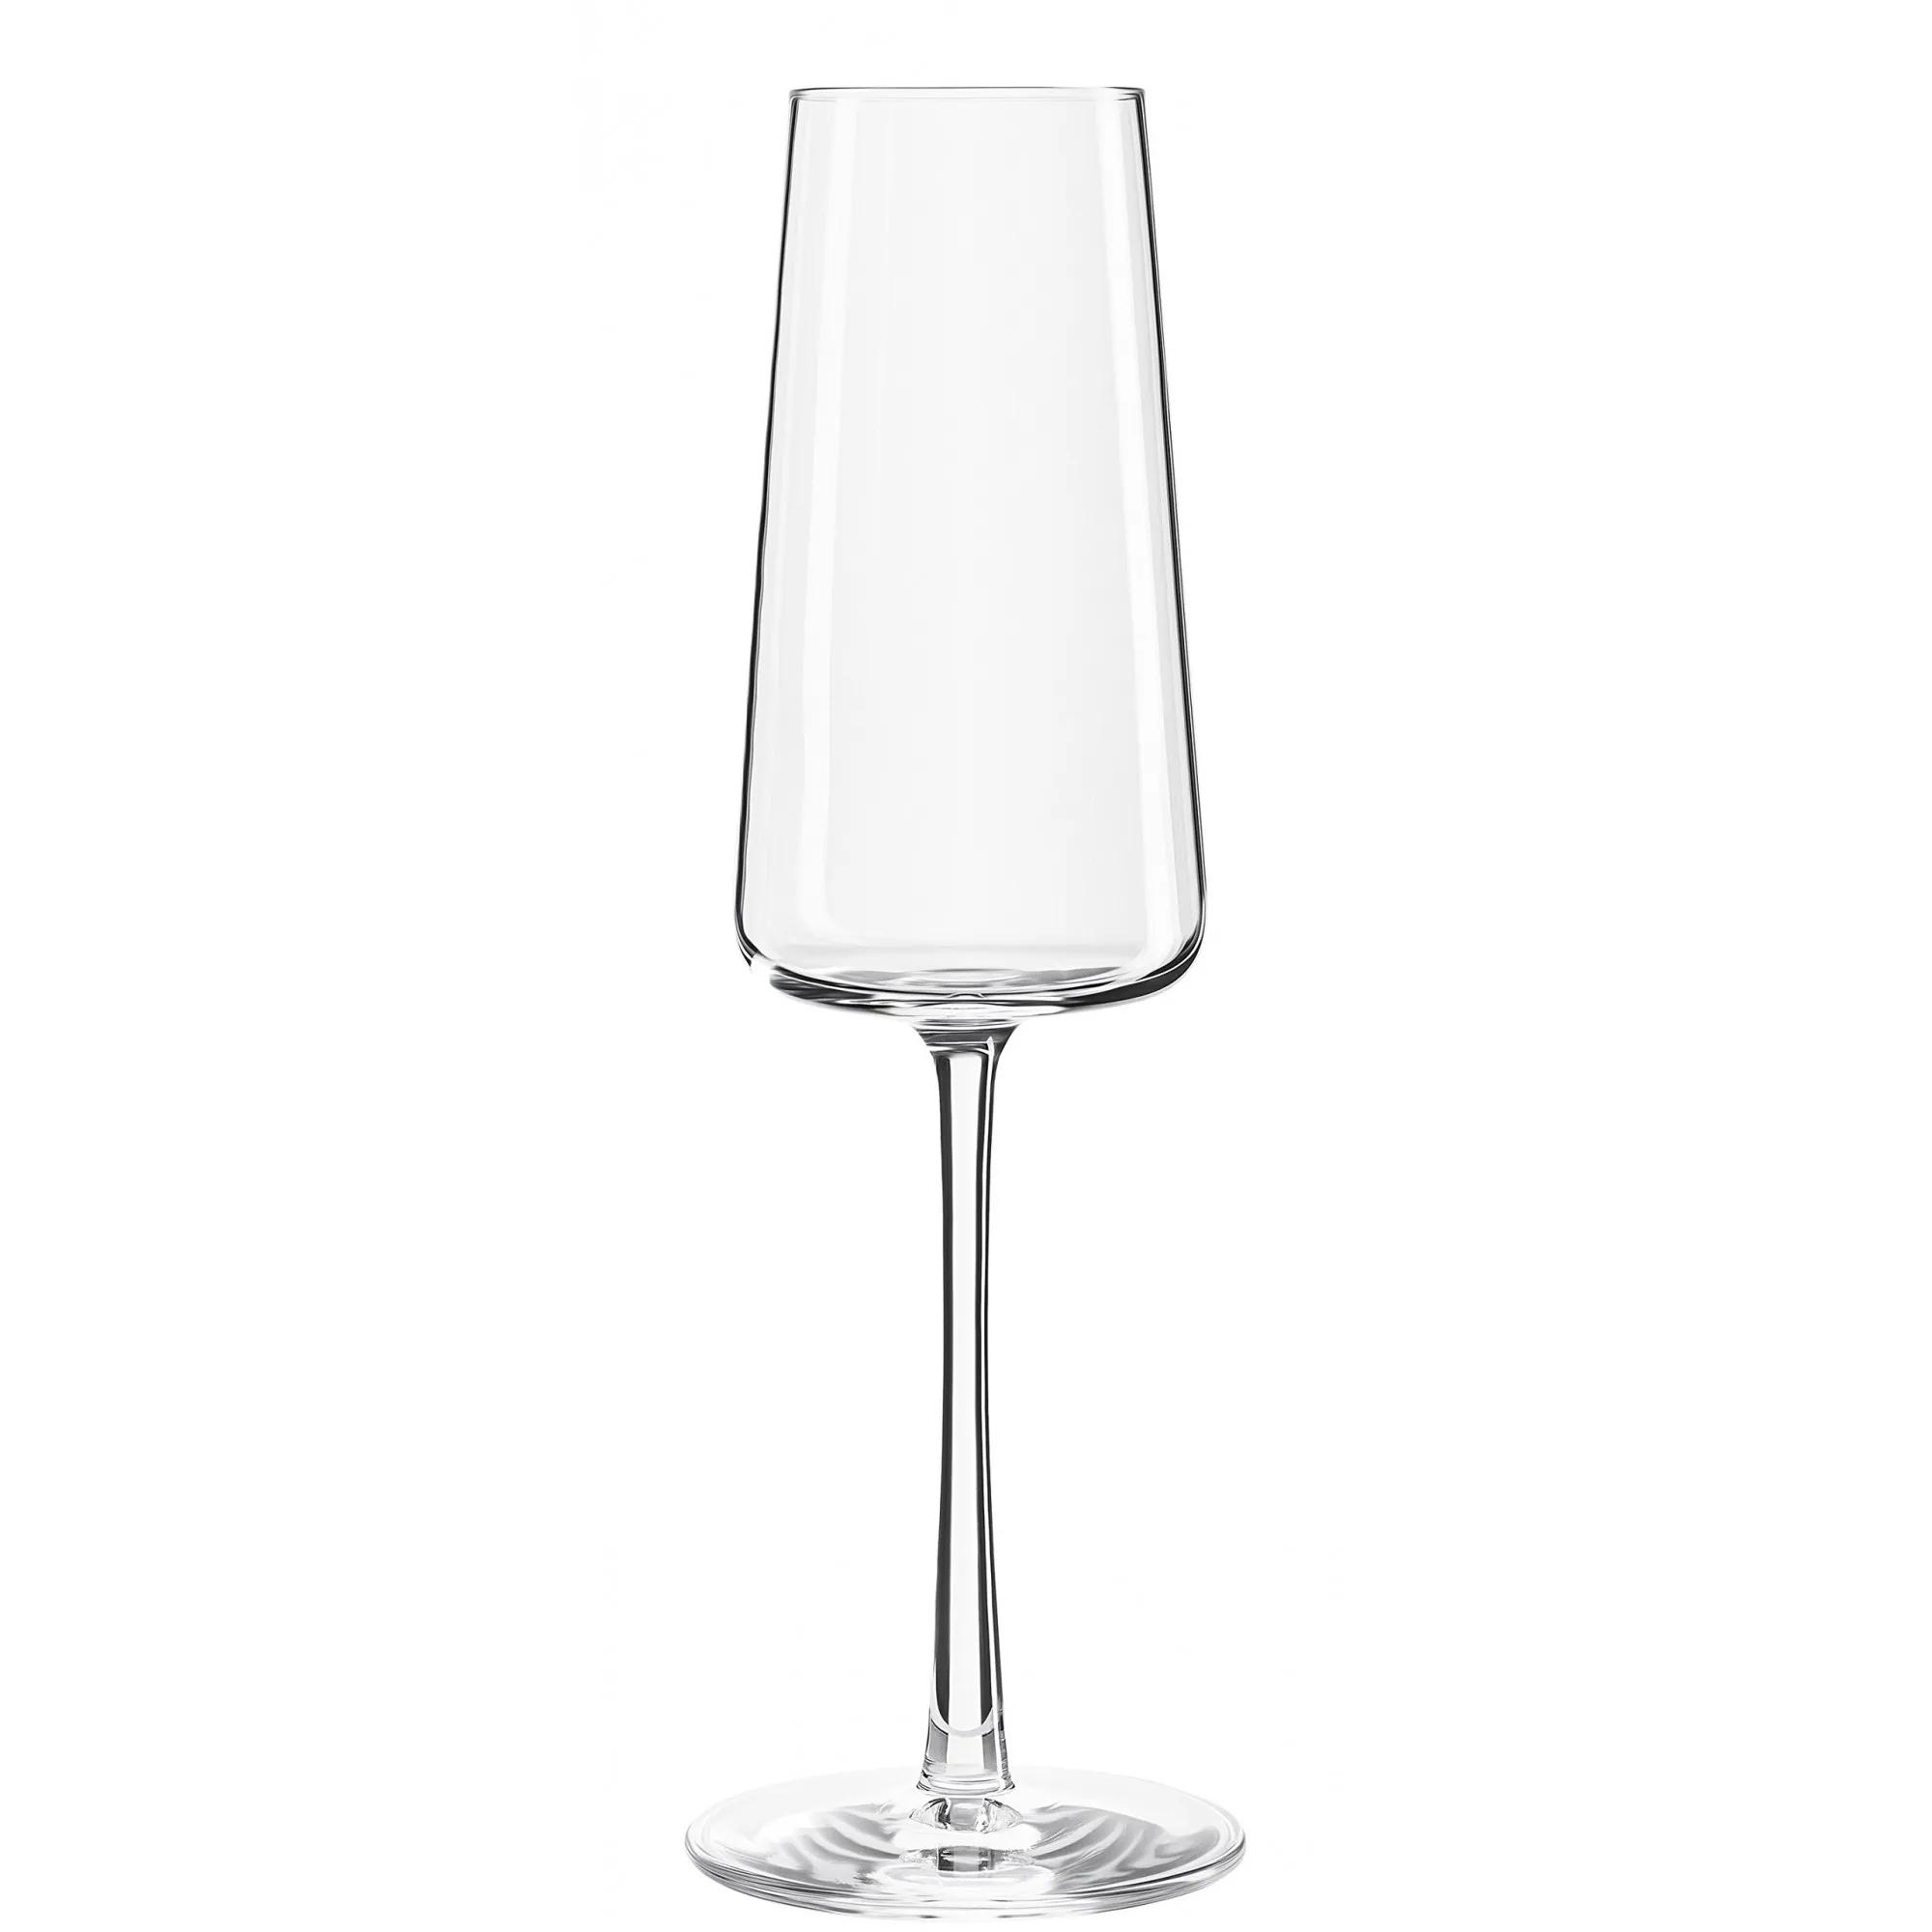 Conjunto De 06 Taças Stölzle Lausitz De Cristal Para Champagne/Prosecco 238Ml Linha Power